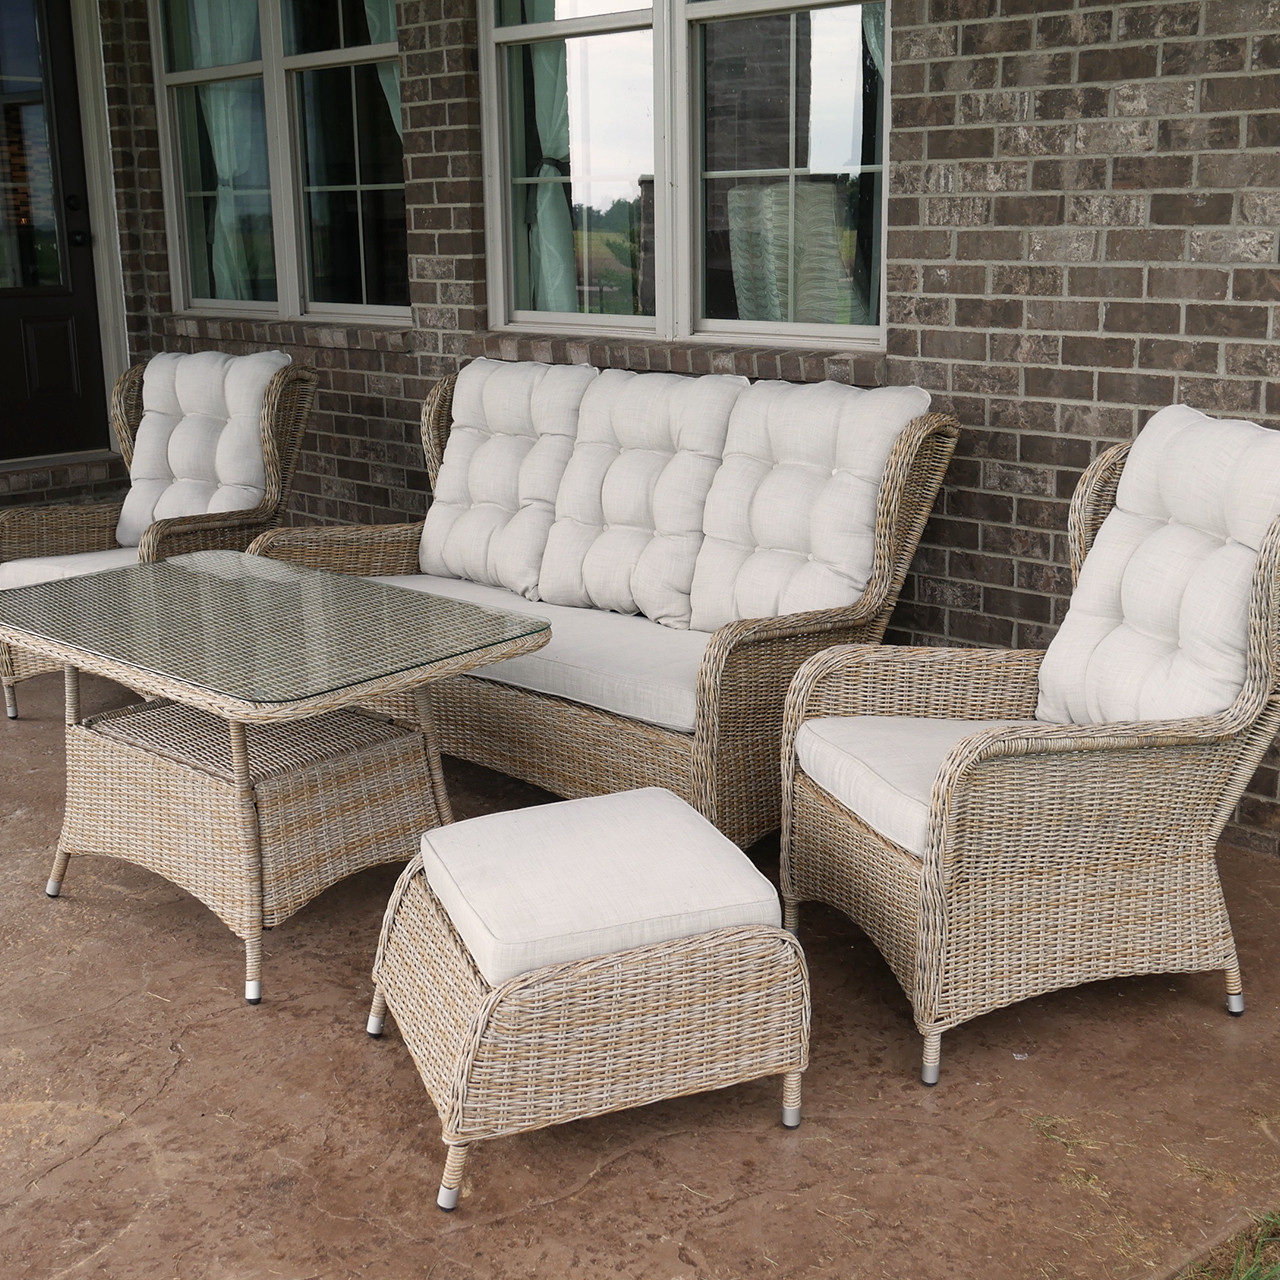 Charleston Way 5-Piece Outdoor Wicker Patio Sofa Set With ... on 5 Piece Sectional Patio Set id=29880